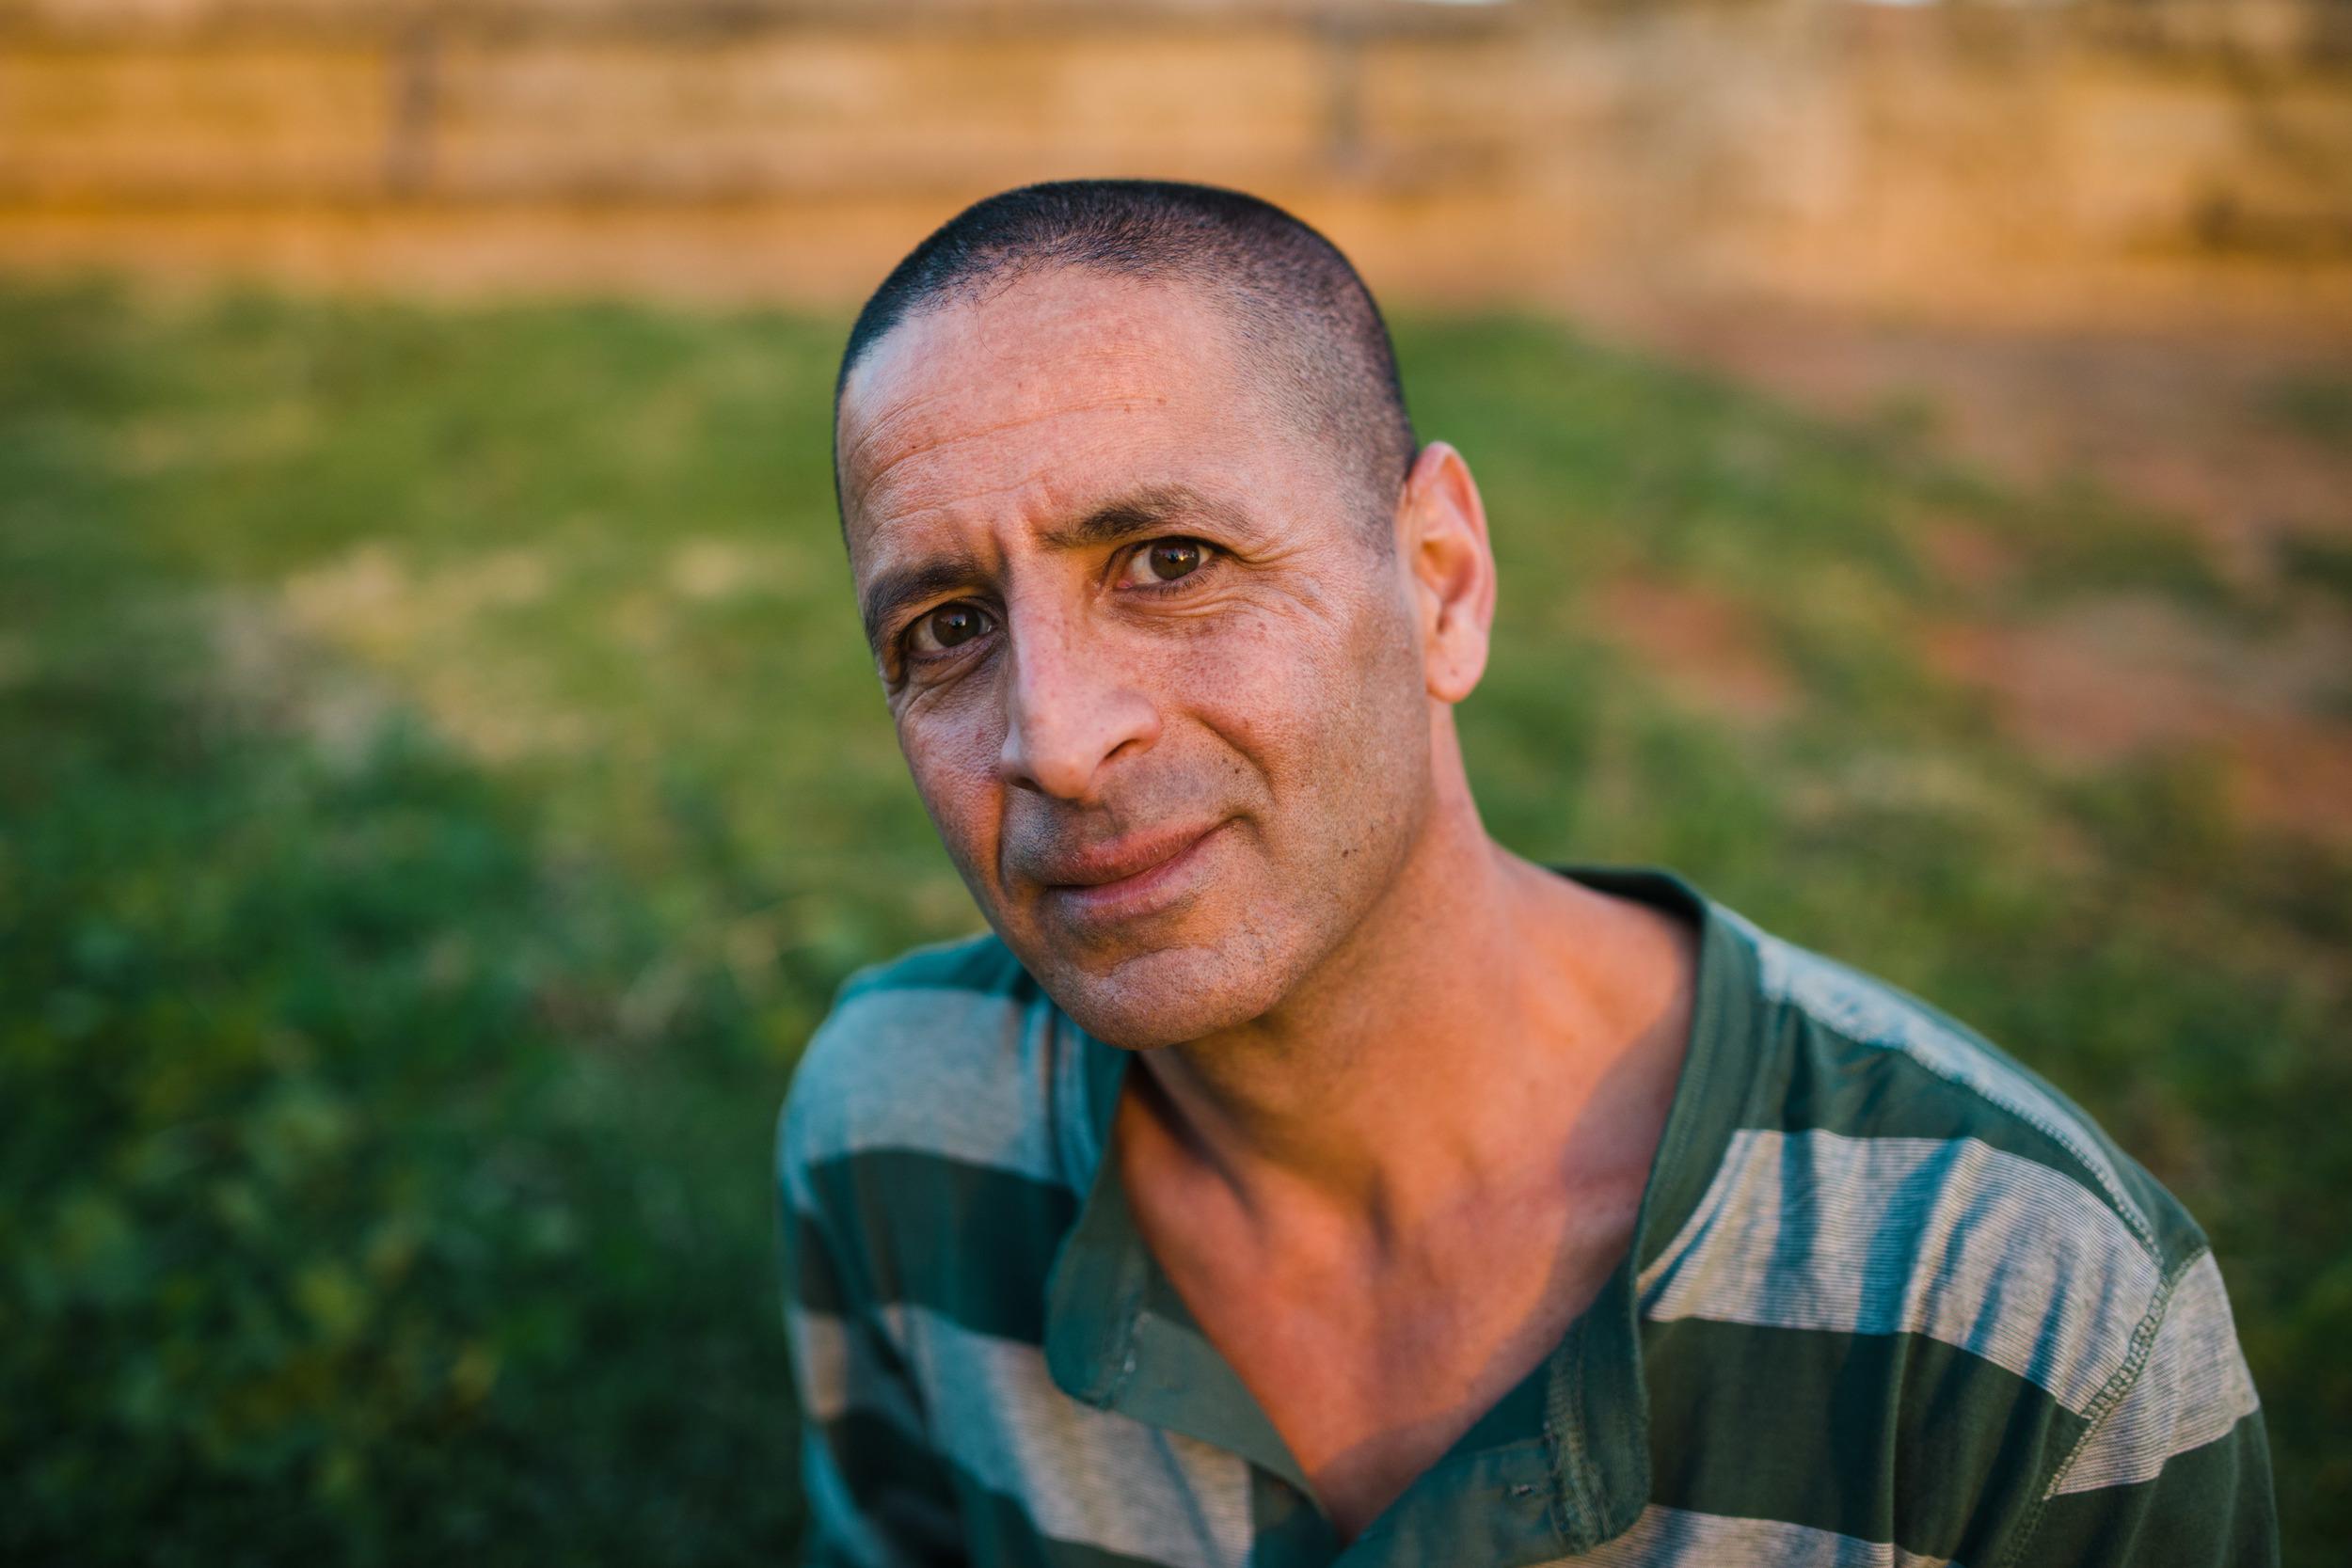 Dror, Israeli tour guide. Jaffa, Israel